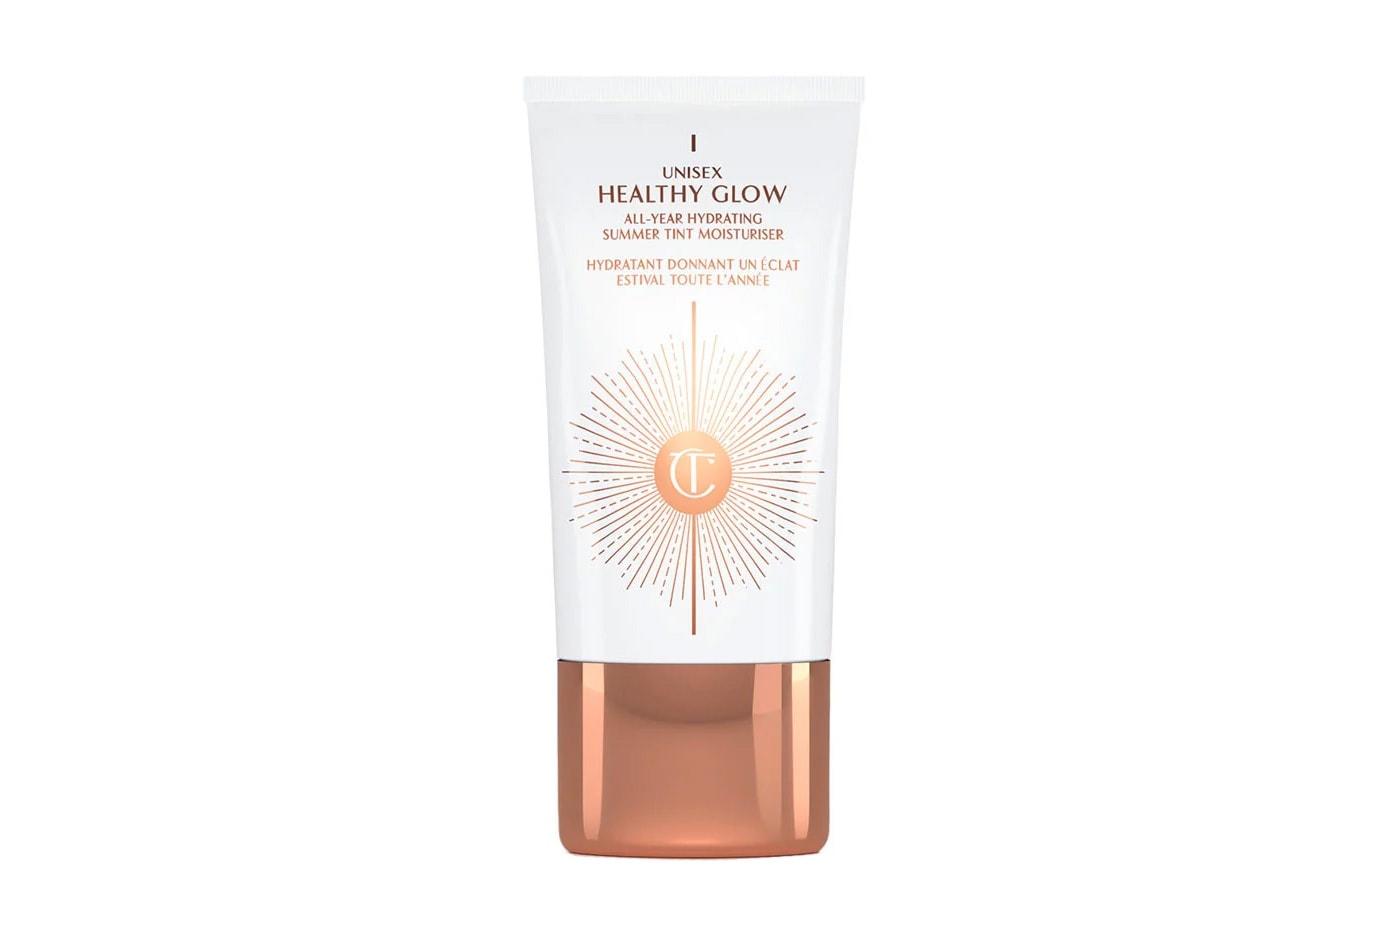 best tinted moisturizers makeup skincare laura mercier chantecaille nars waso shiseido benefit charlotte tilbury